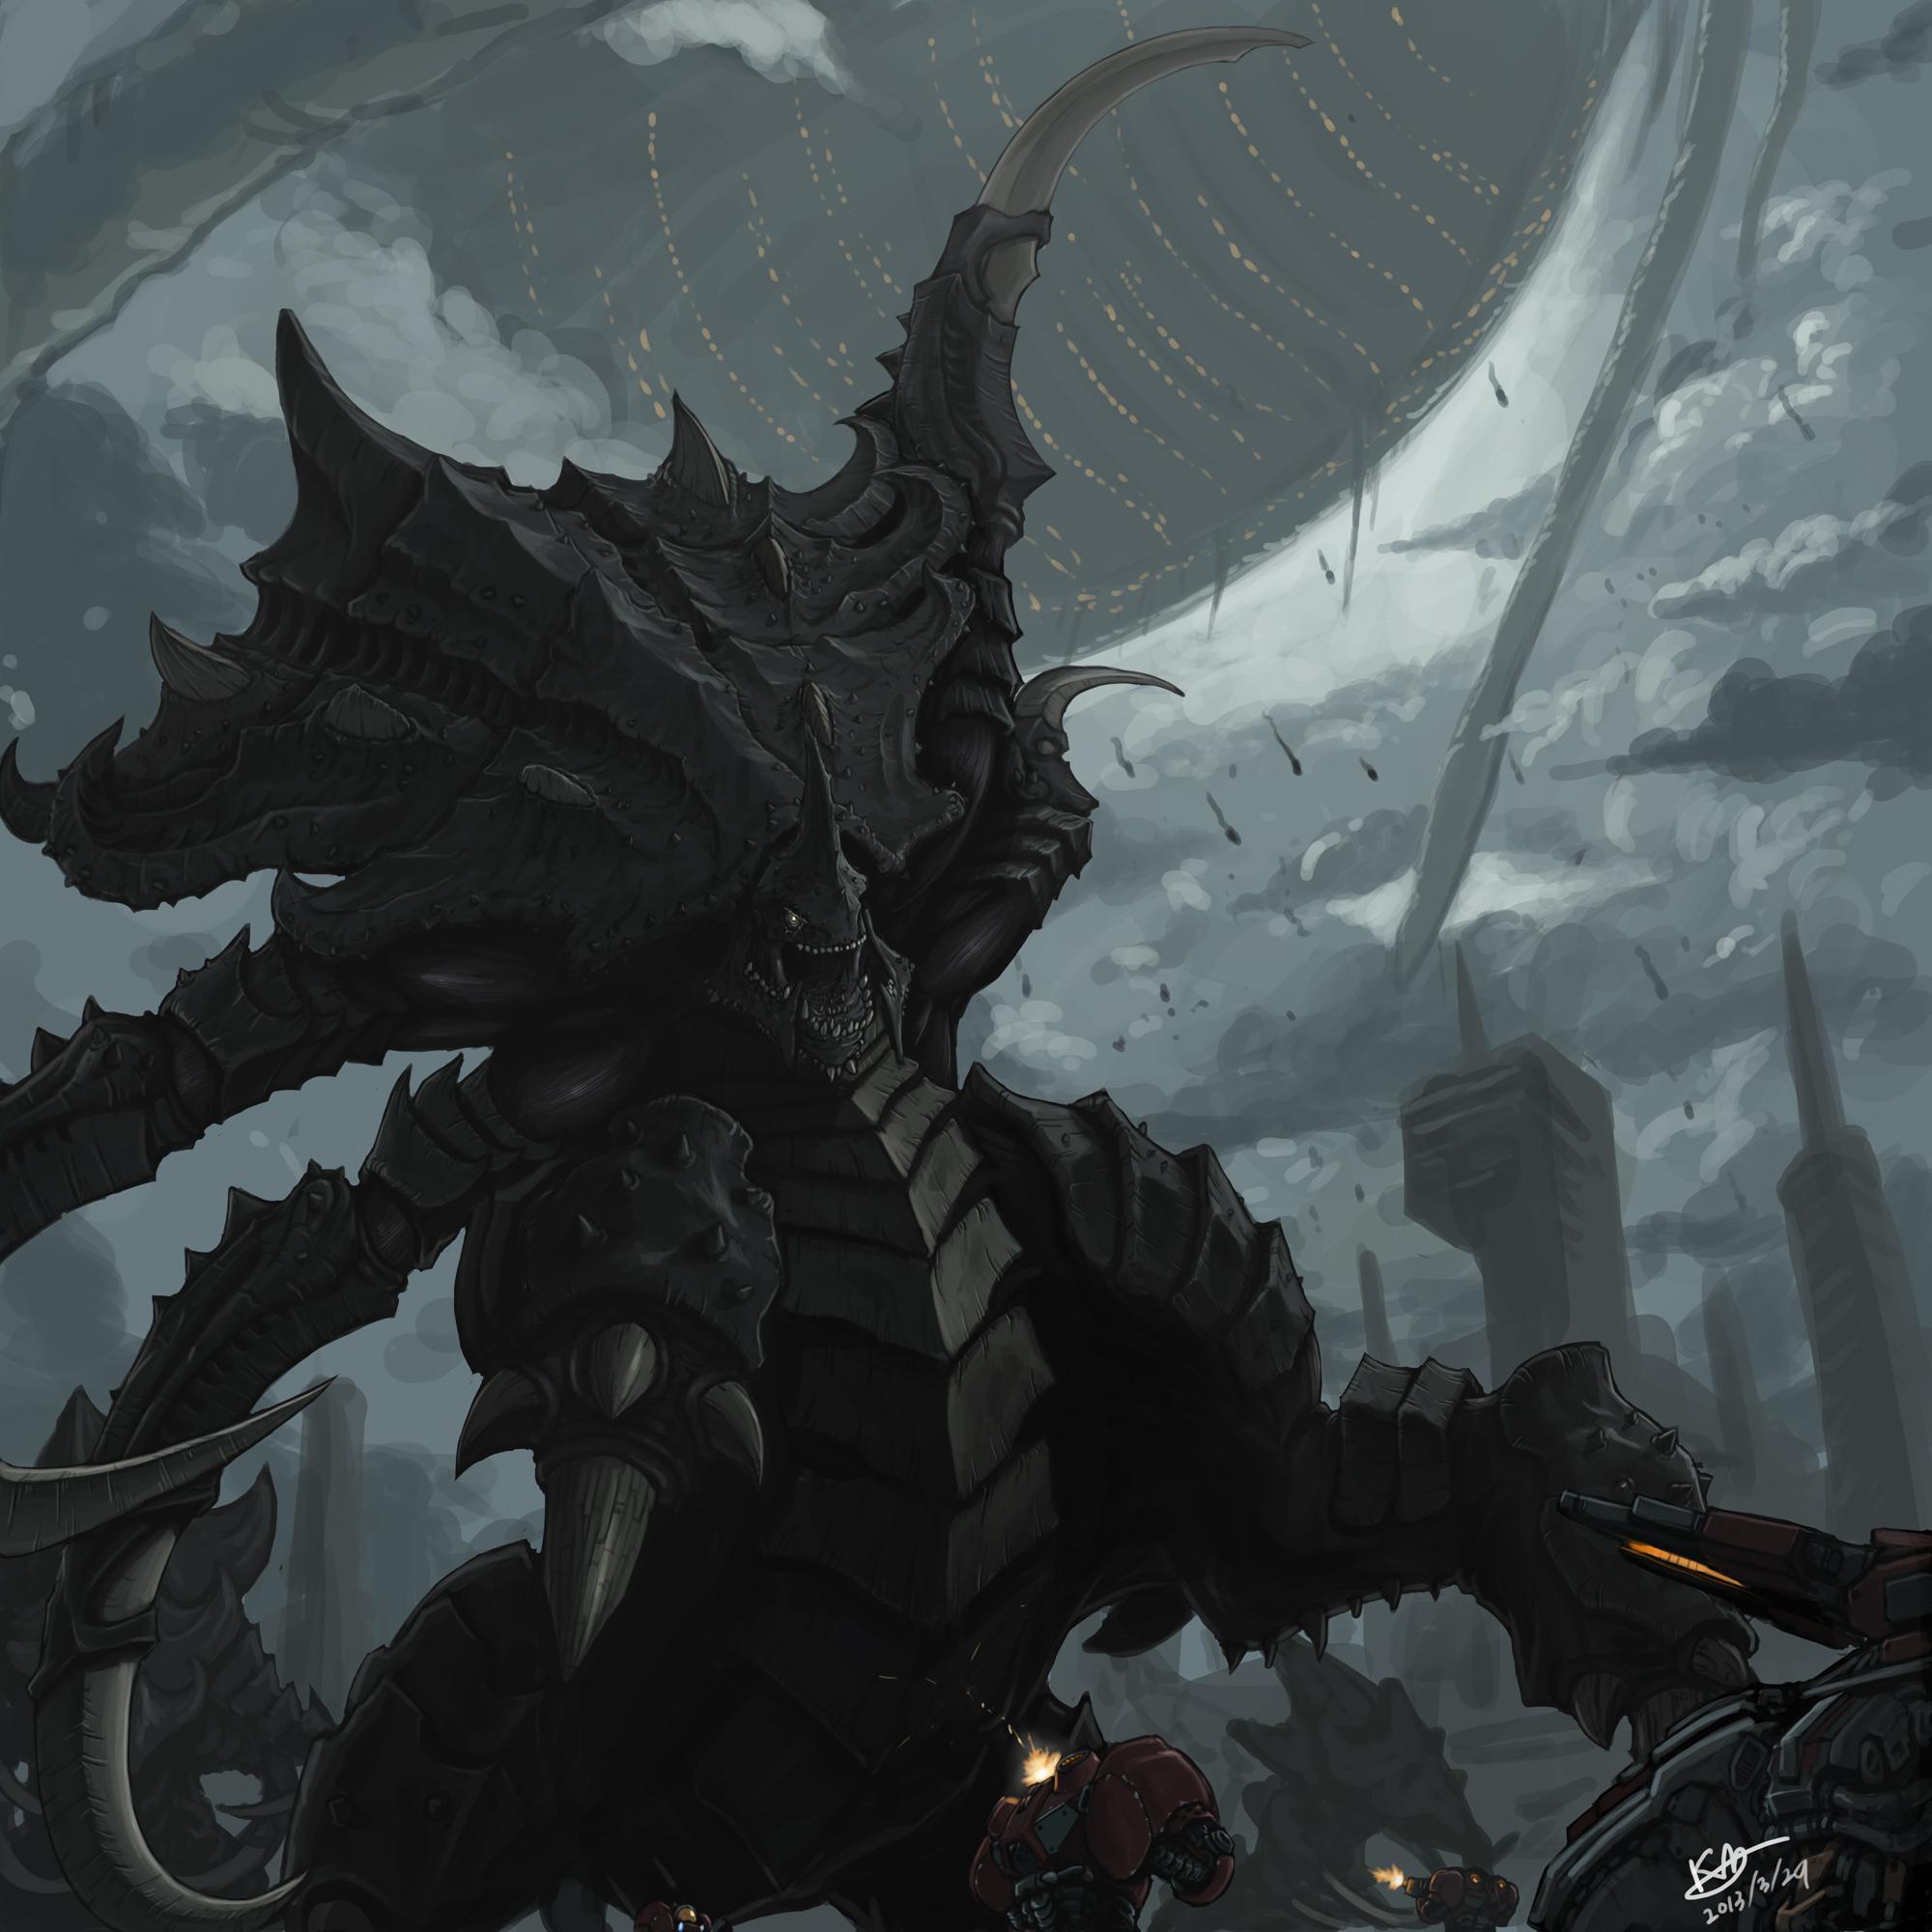 StarCraft 2 Ultralisk by kimbbq